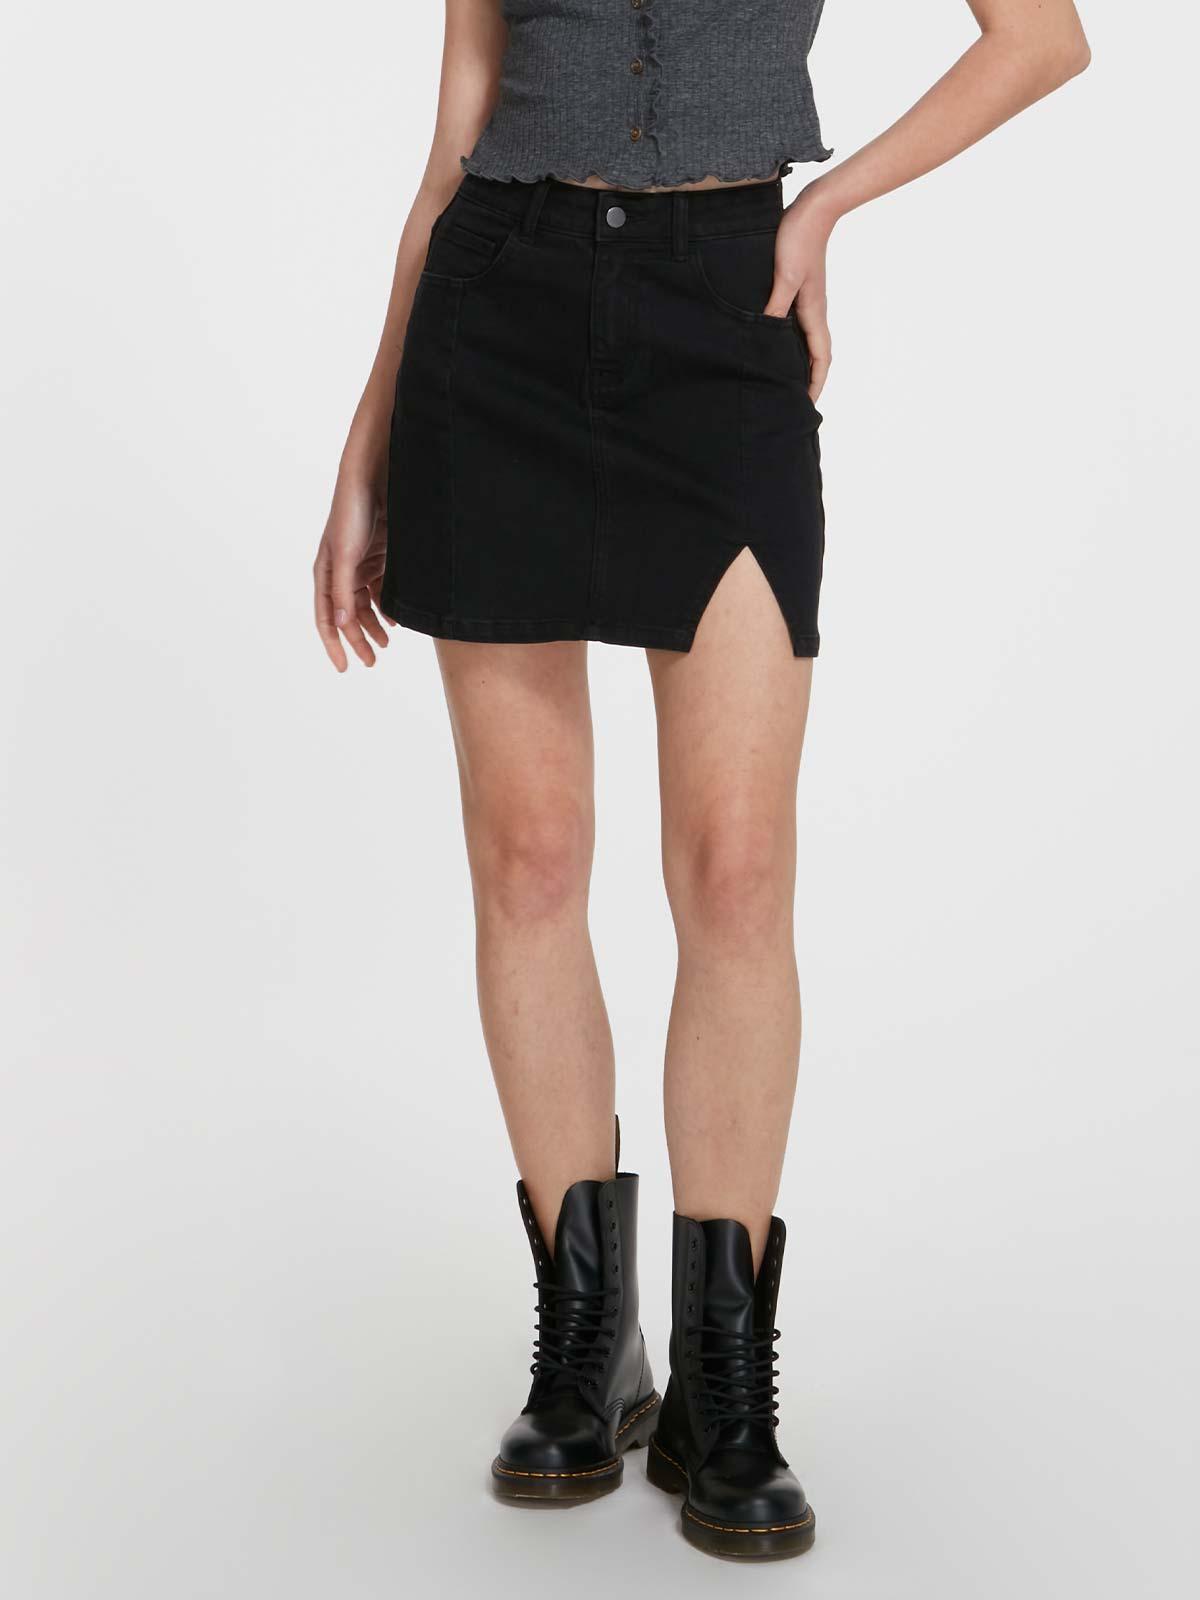 DEVA, 高腰牛仔短裙褲 PN08922